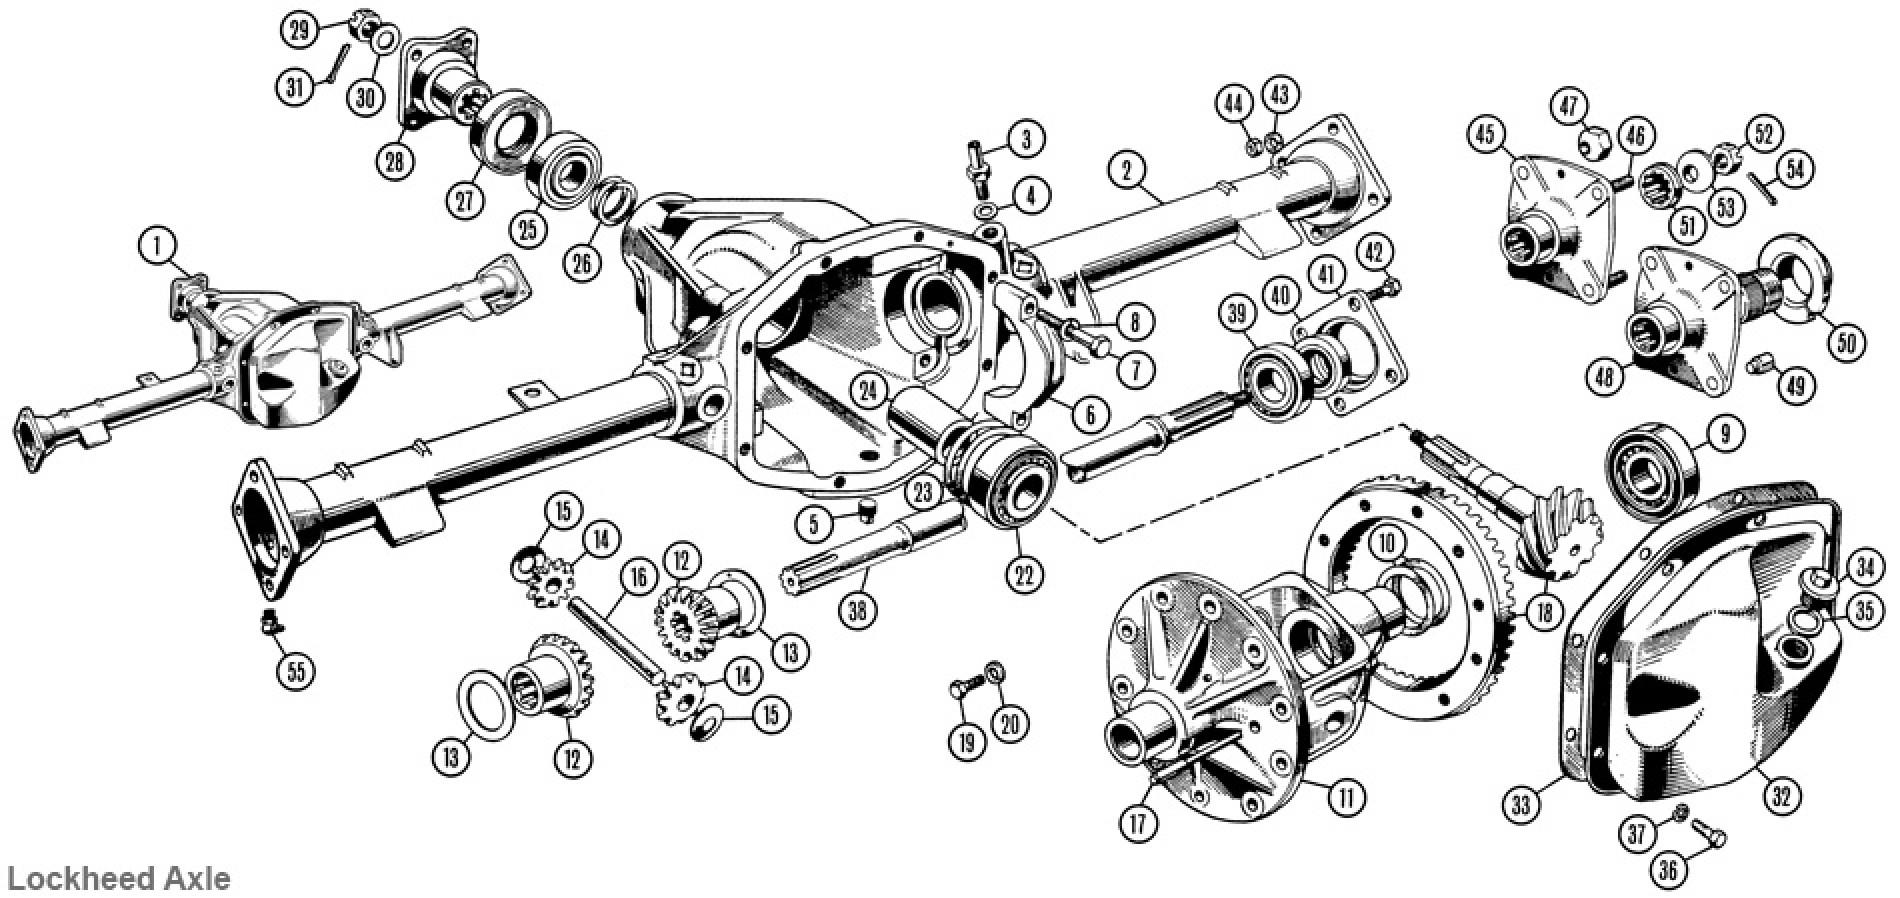 Rear Axle Lockheed